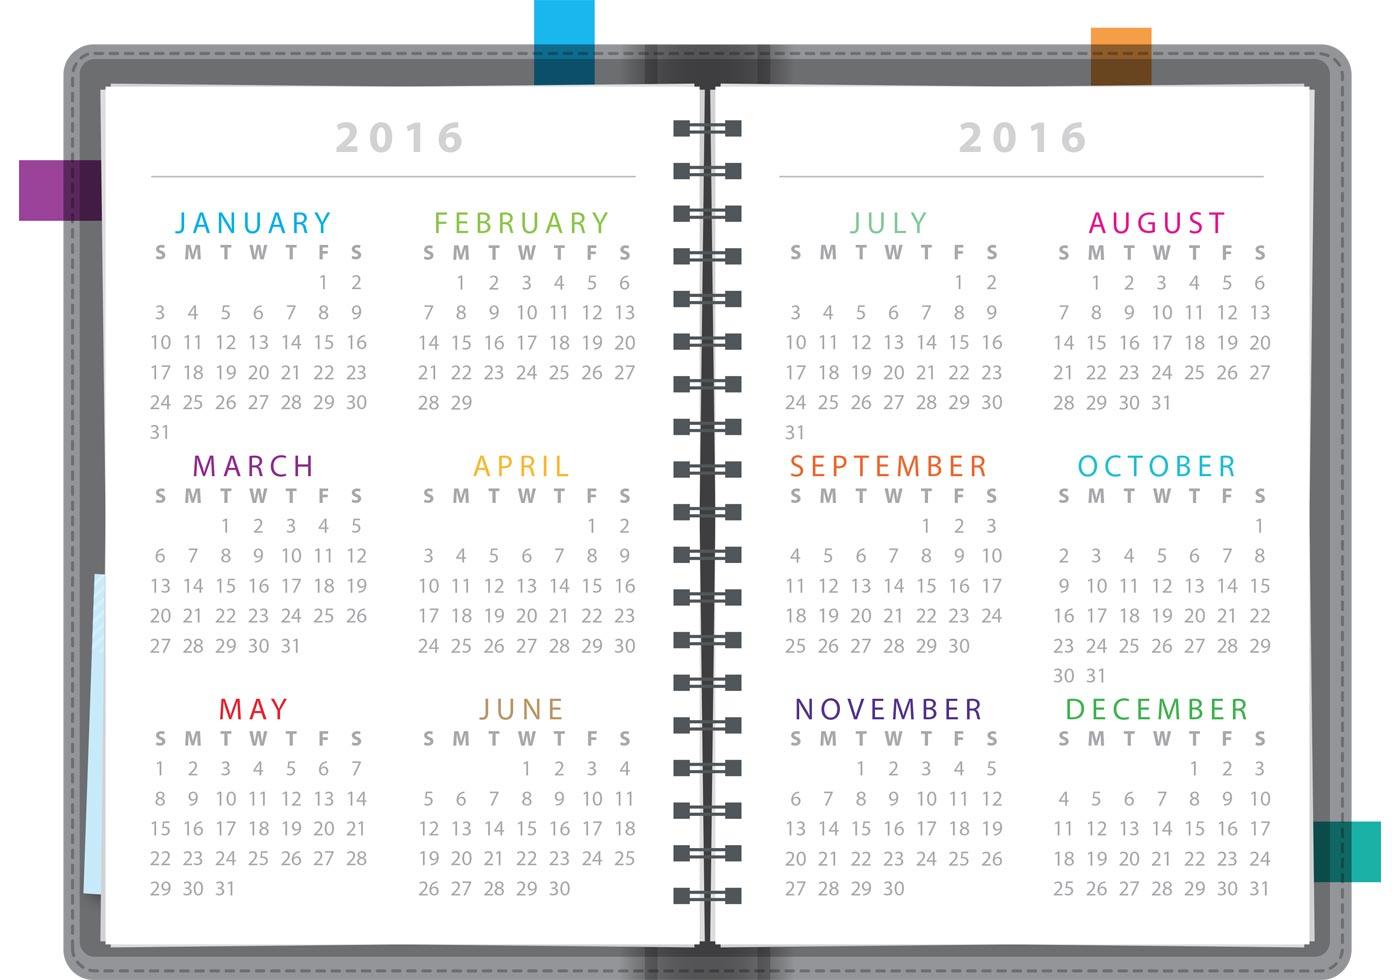 Calendar Notebook 2016 - Download Free Vector Art, Stock ...